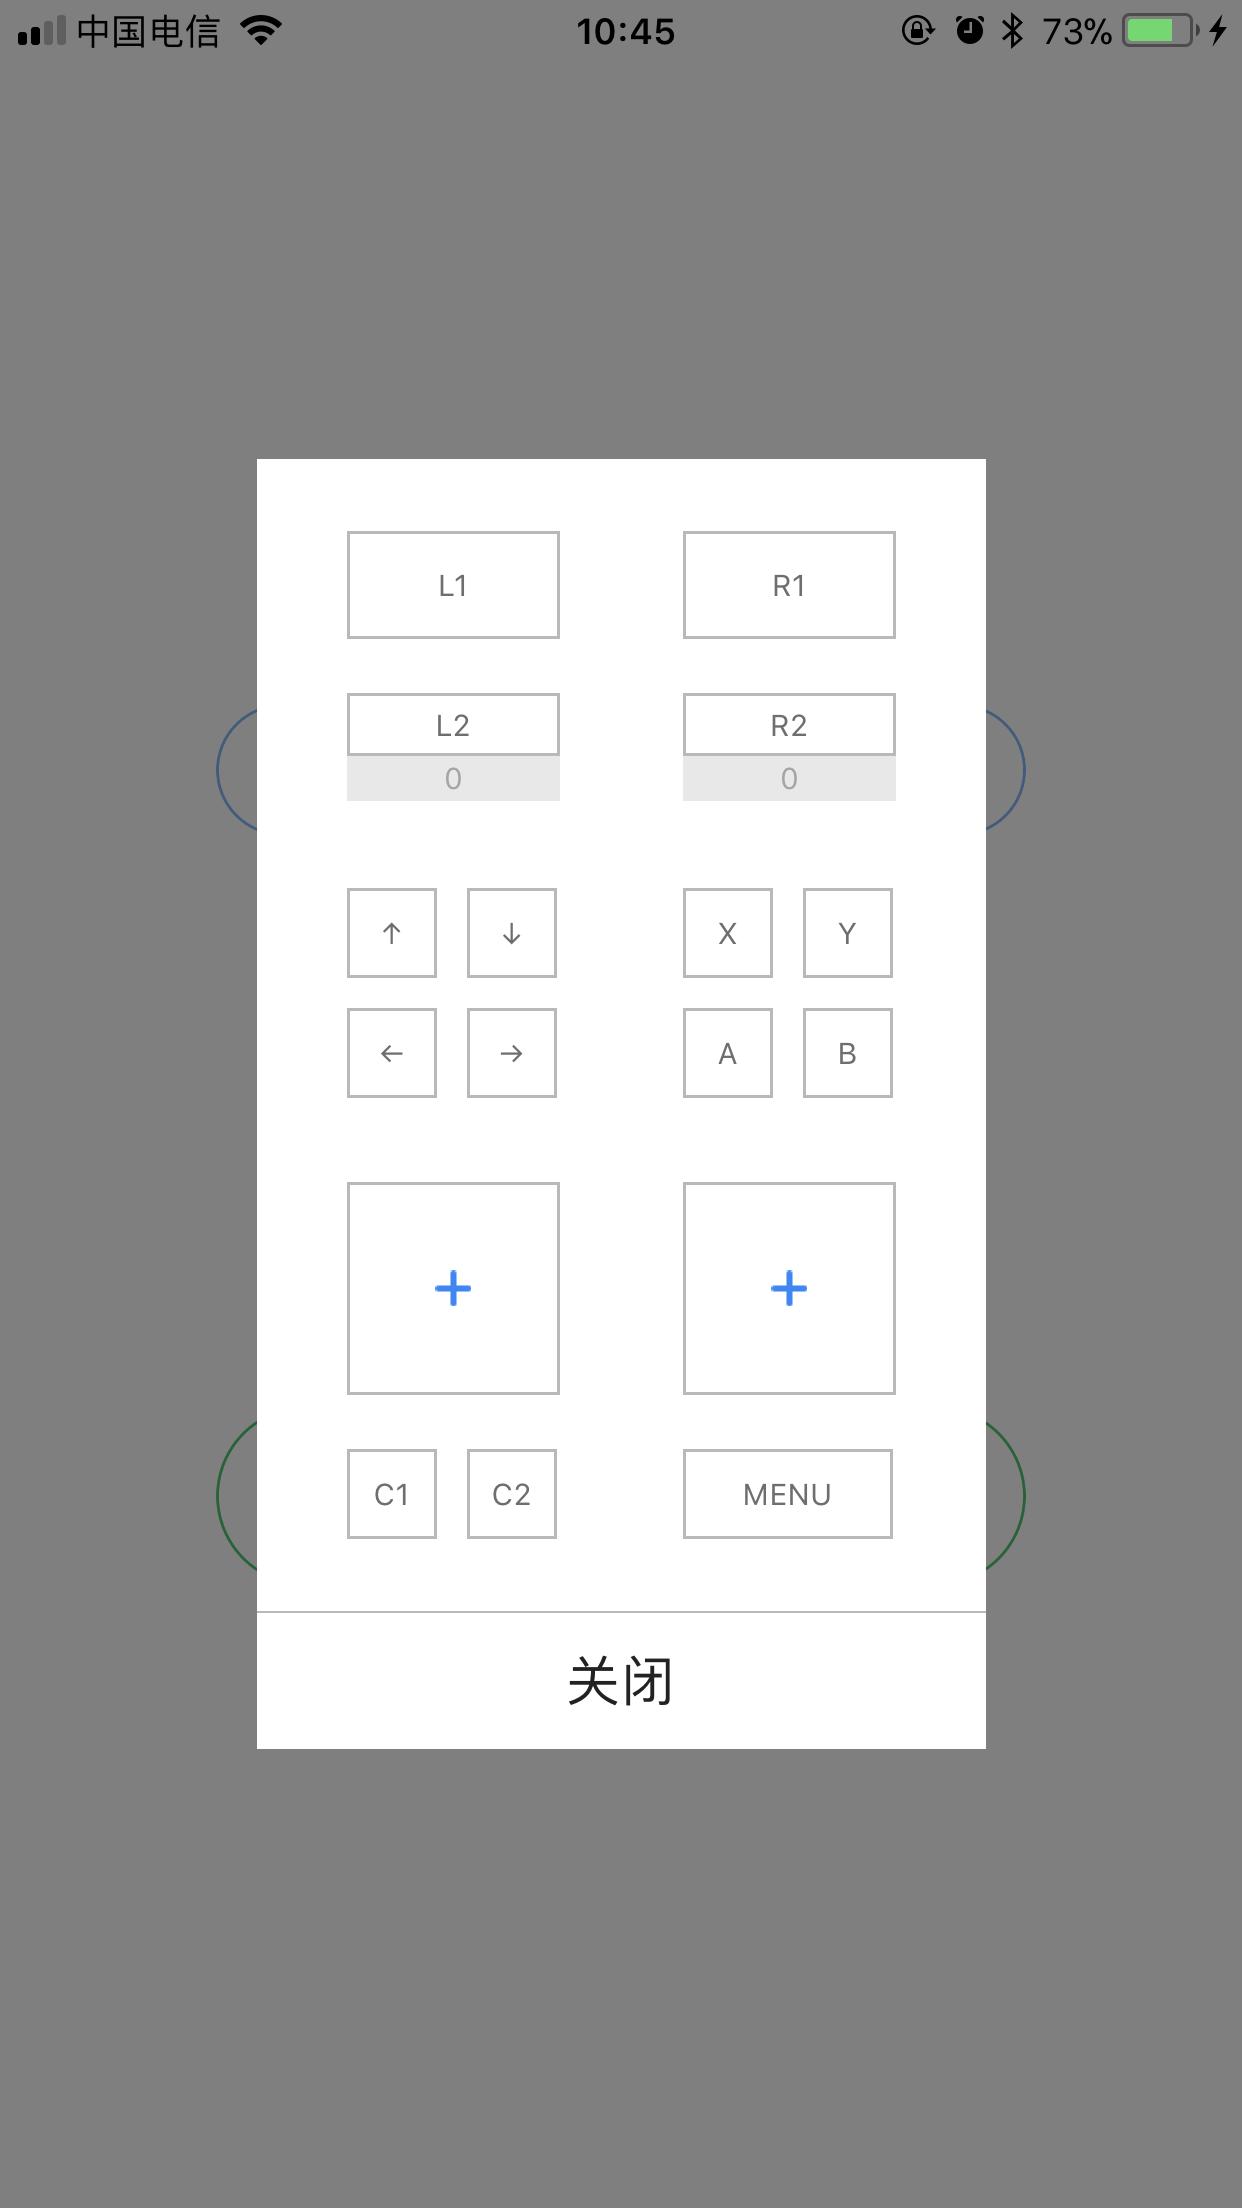 T1d升级助手 V1.2 安卓版截图1